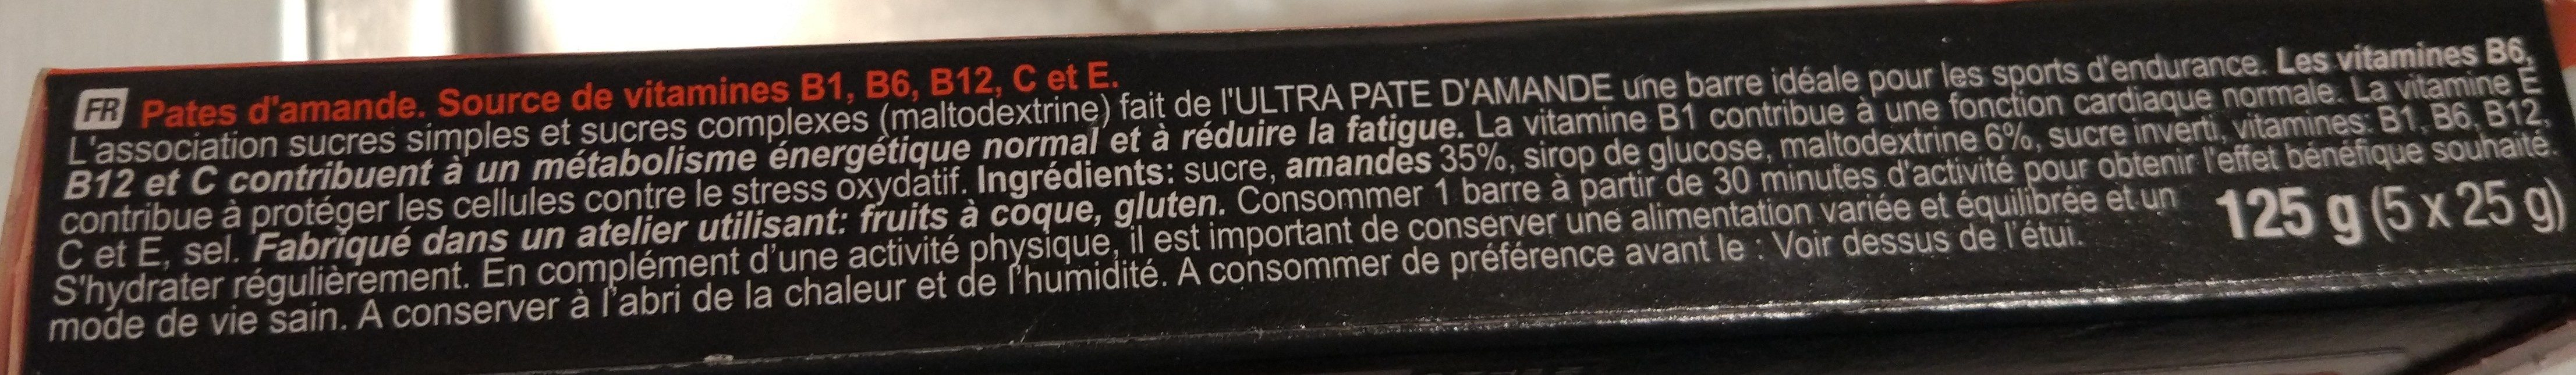 Barre amande - Ingredientes - fr